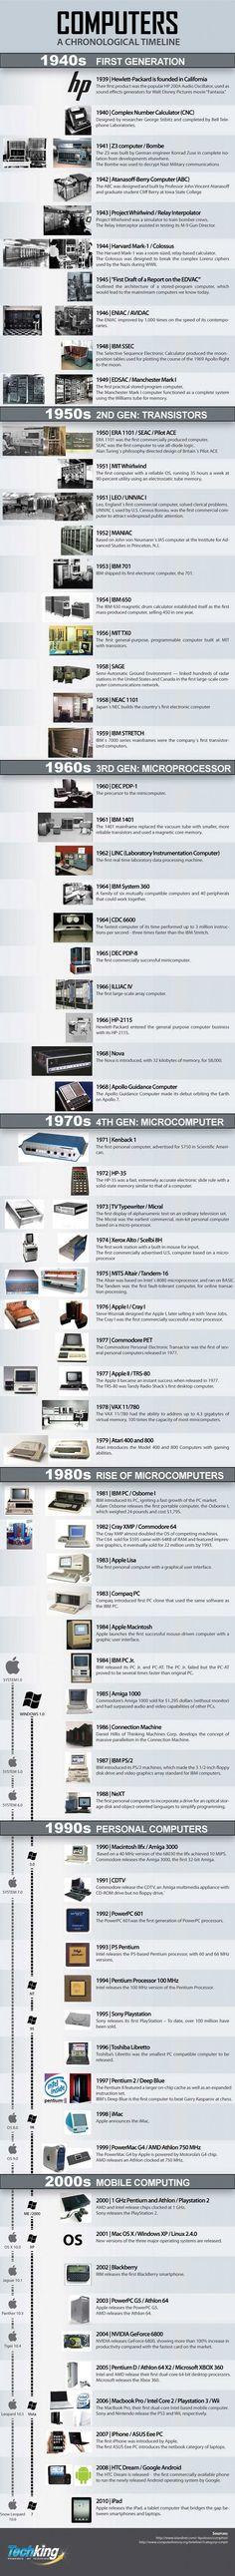 Computer History.